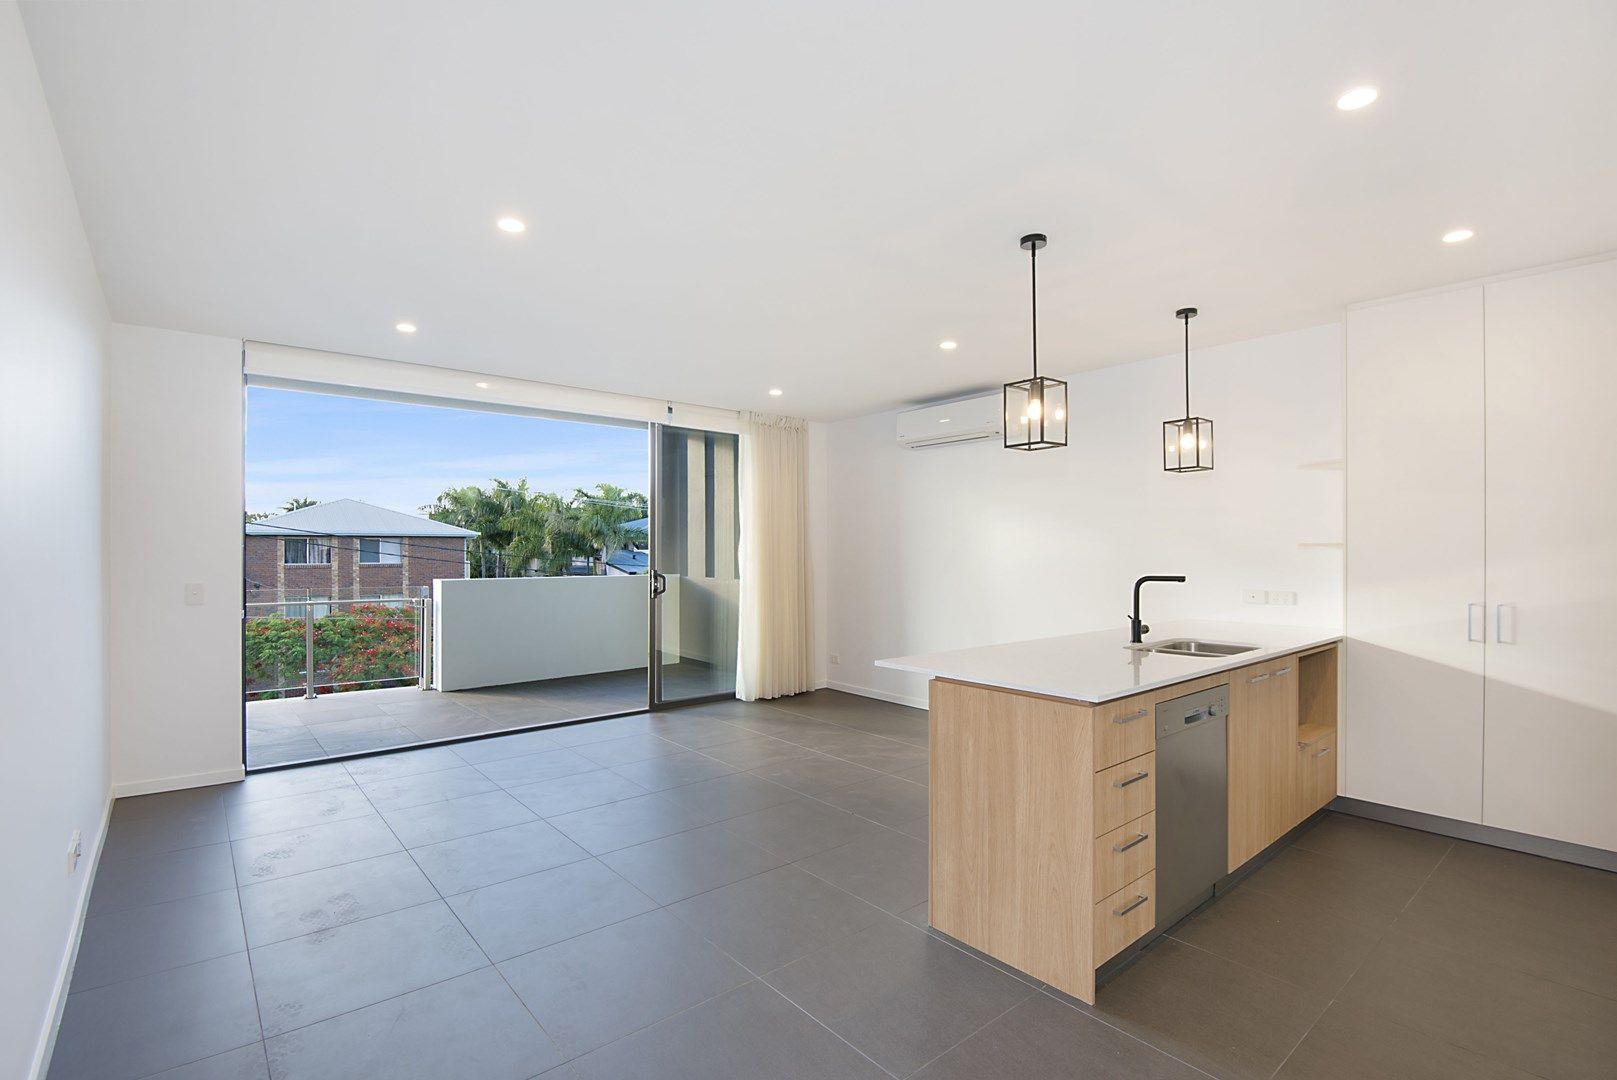 312/25 Onslow Street, Ascot QLD 4007, Image 1